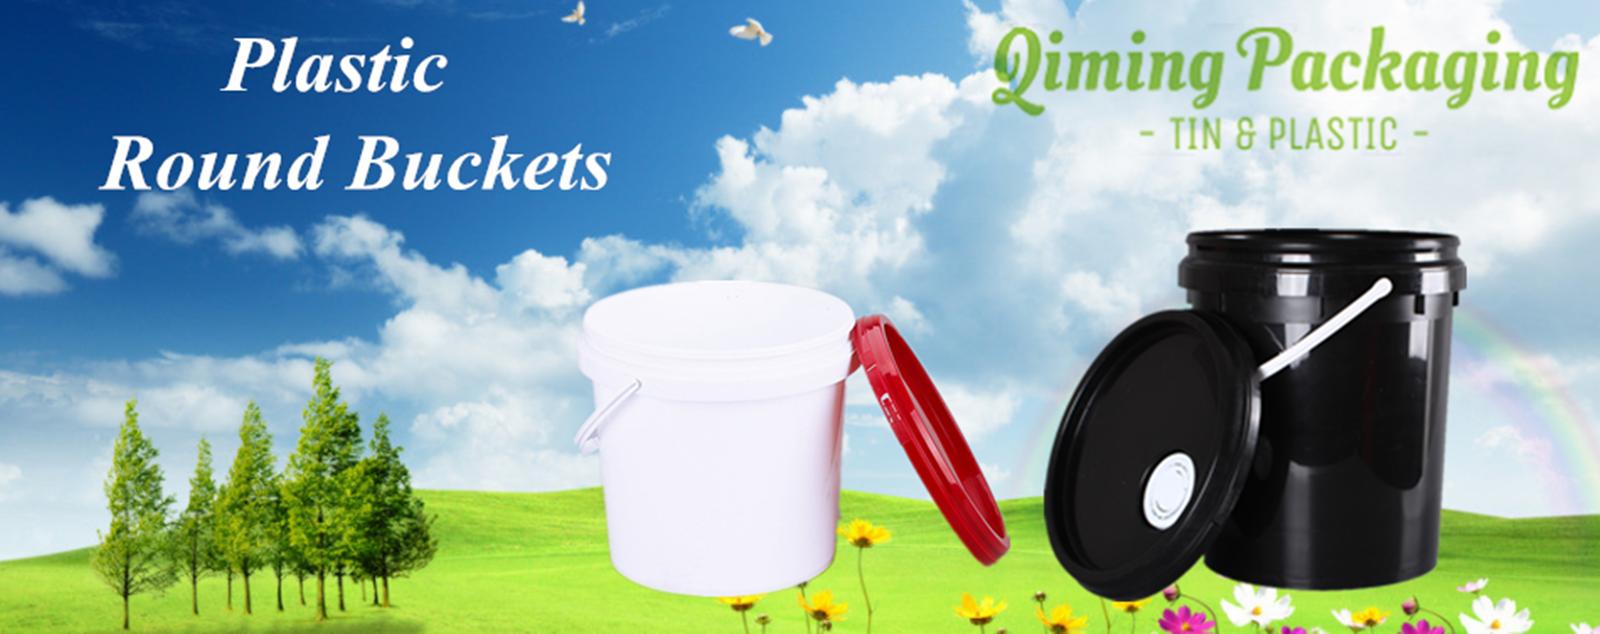 plastic round buckets